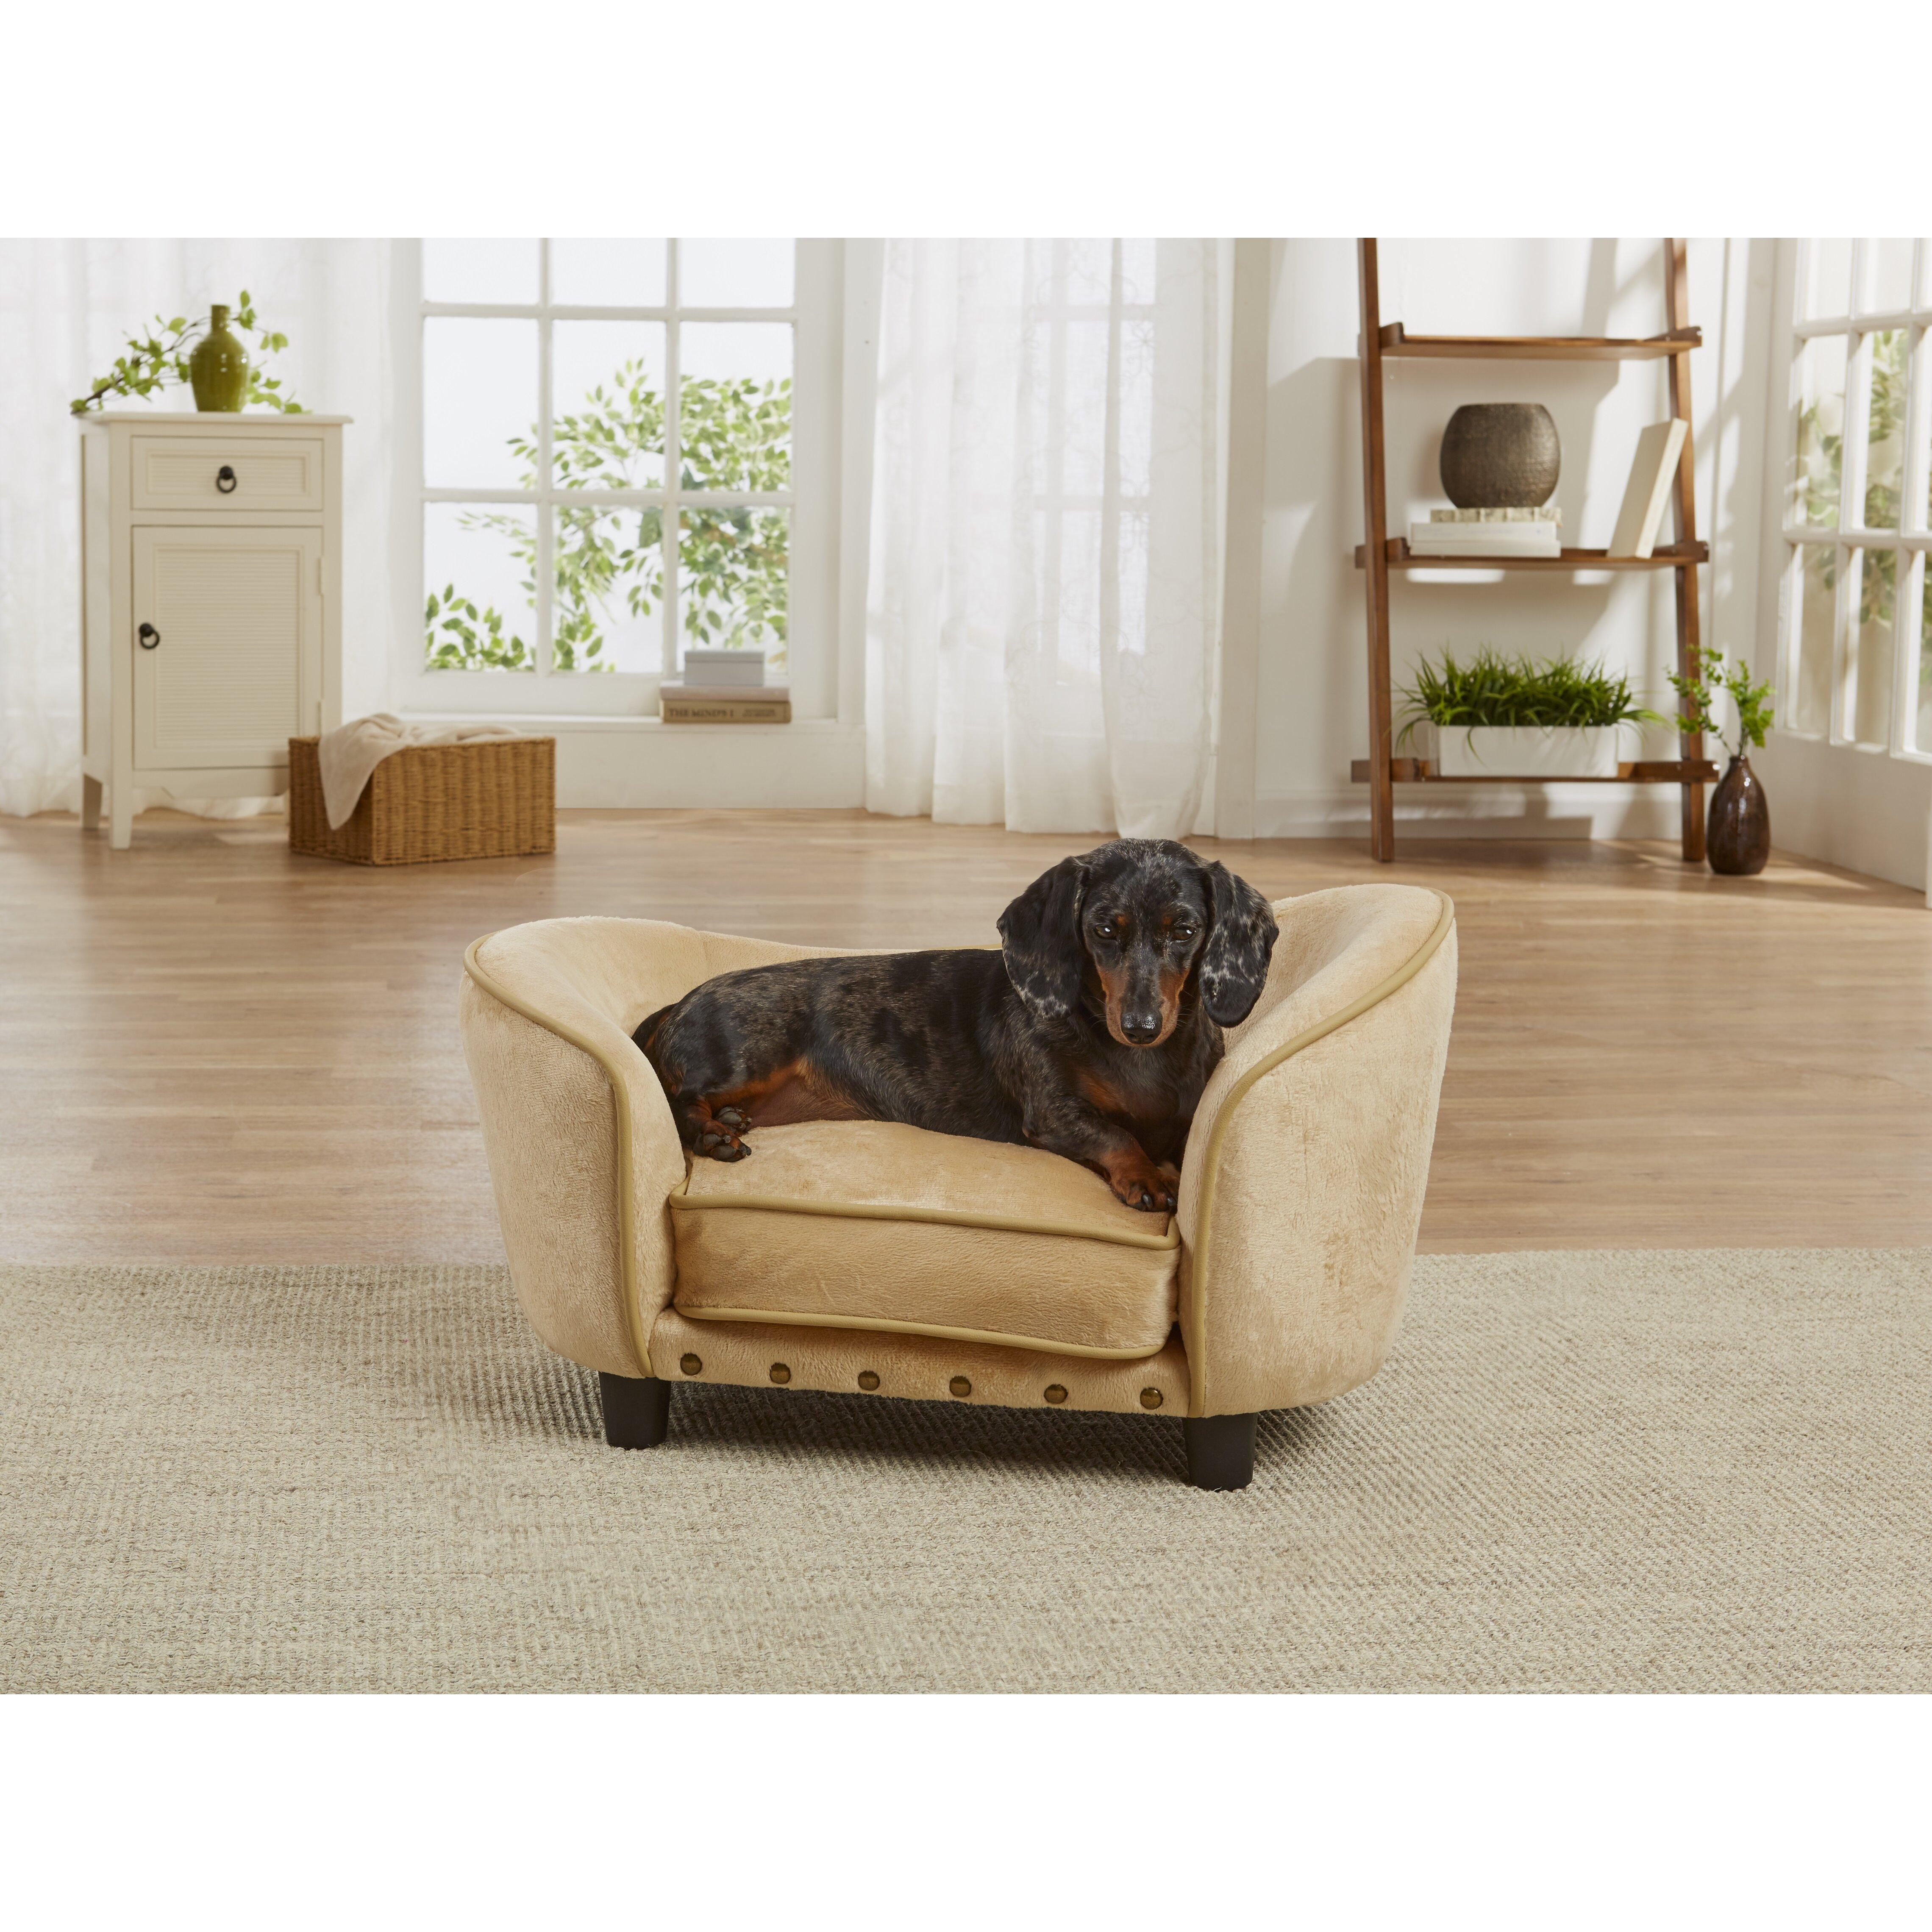 Enchanted Home Pet Ultra Plush Snuggle Dog Sofa With Cushion Reviews Wayfair